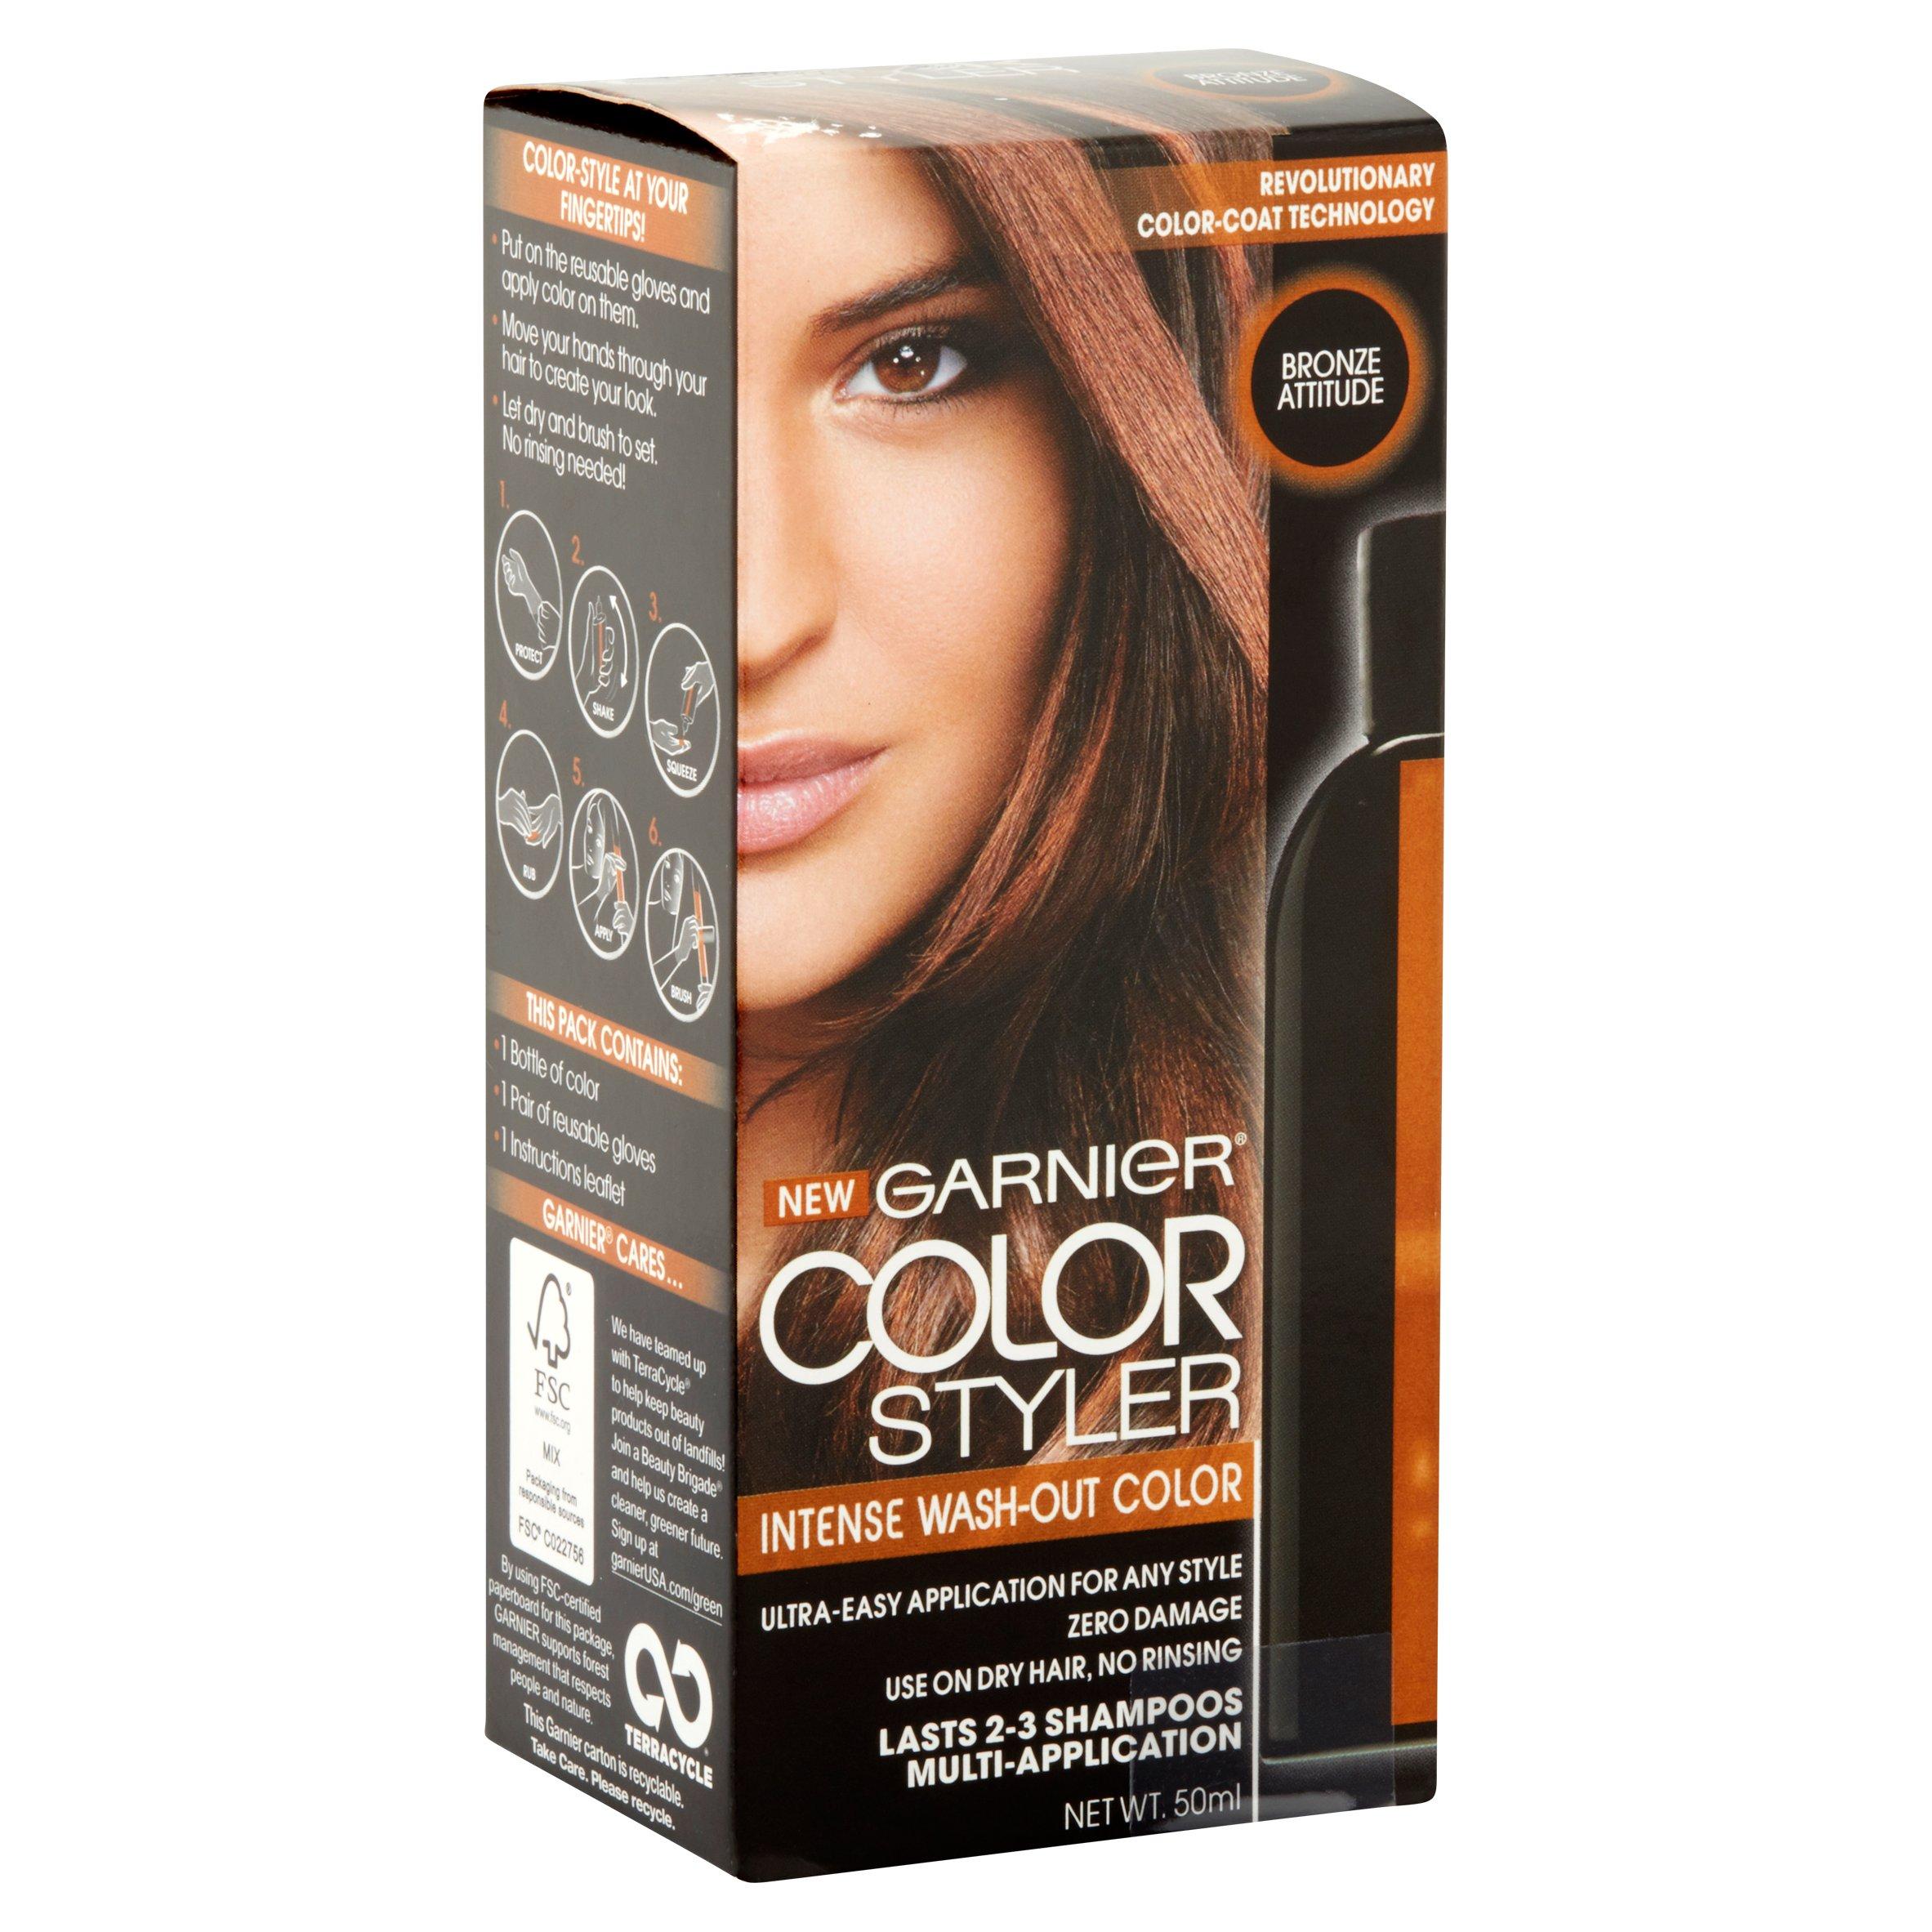 Mg Nutrisse Garnier Color Styler Bronze Attitude Walmart